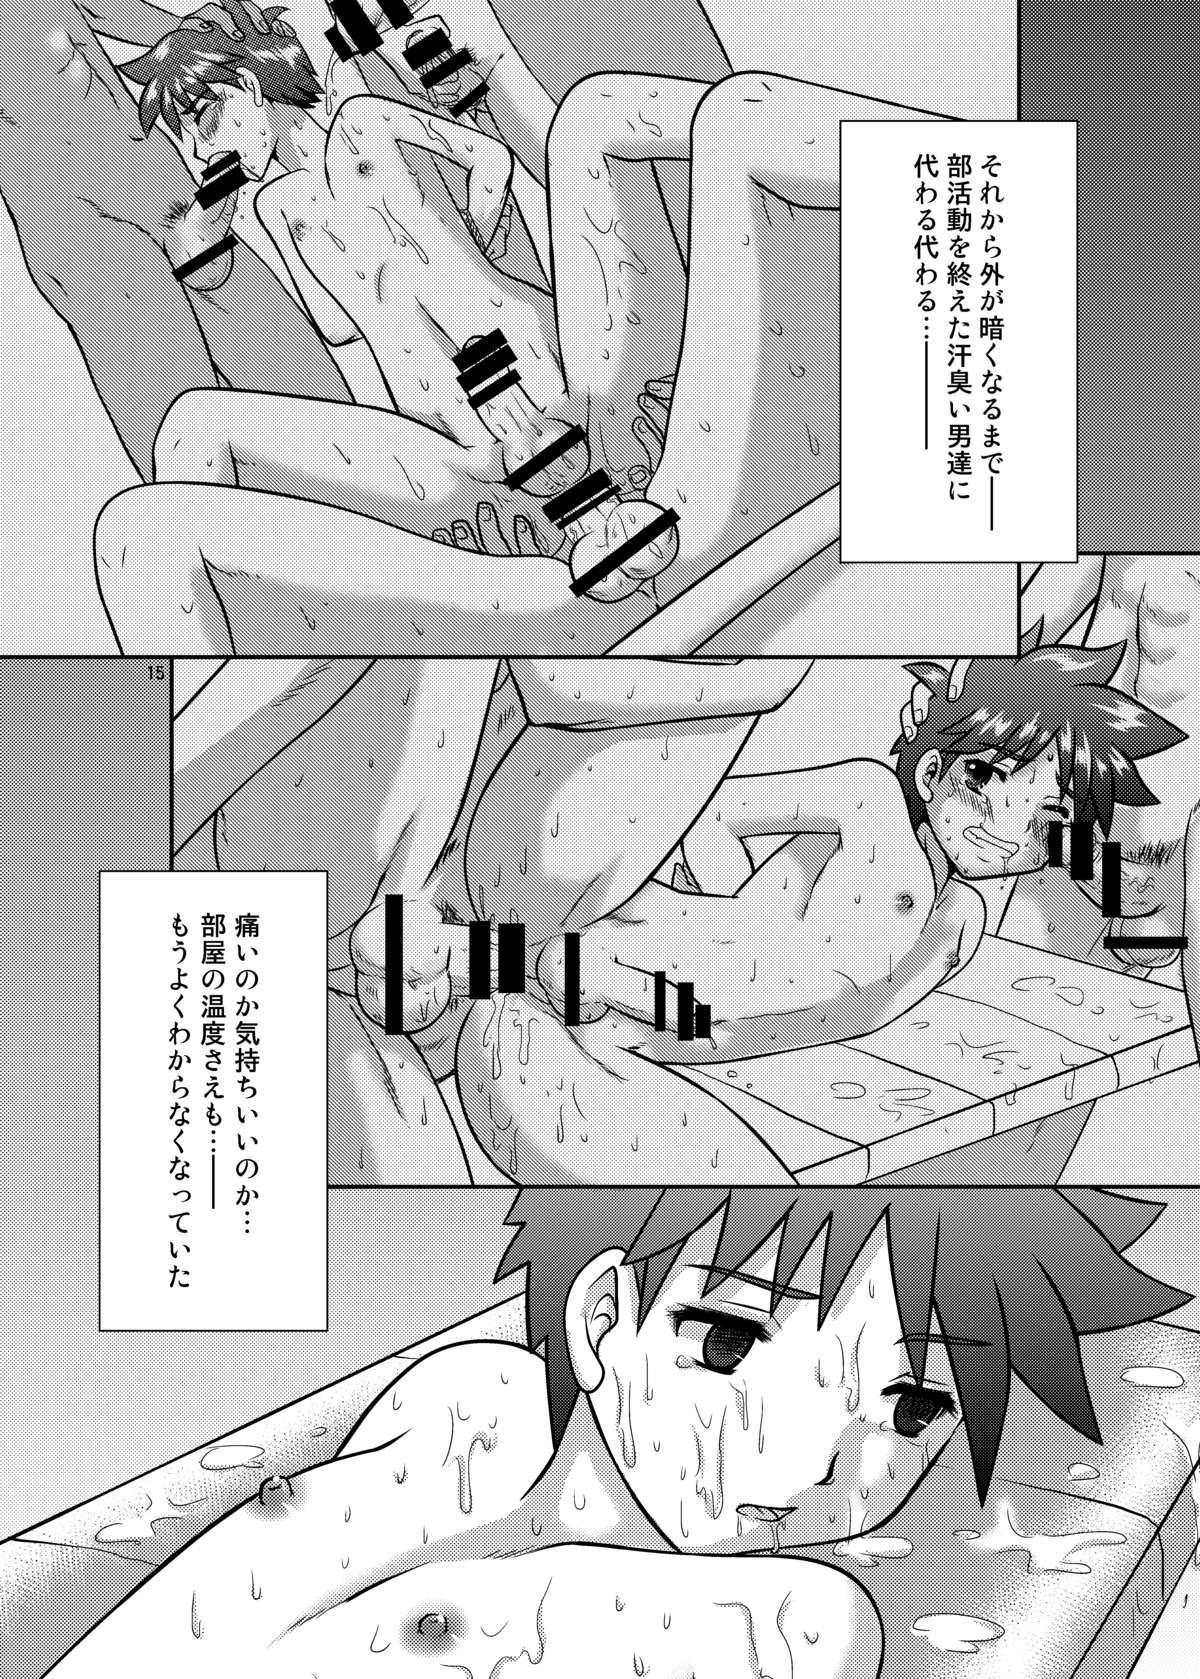 Boku wa Migawari Manager 01 14